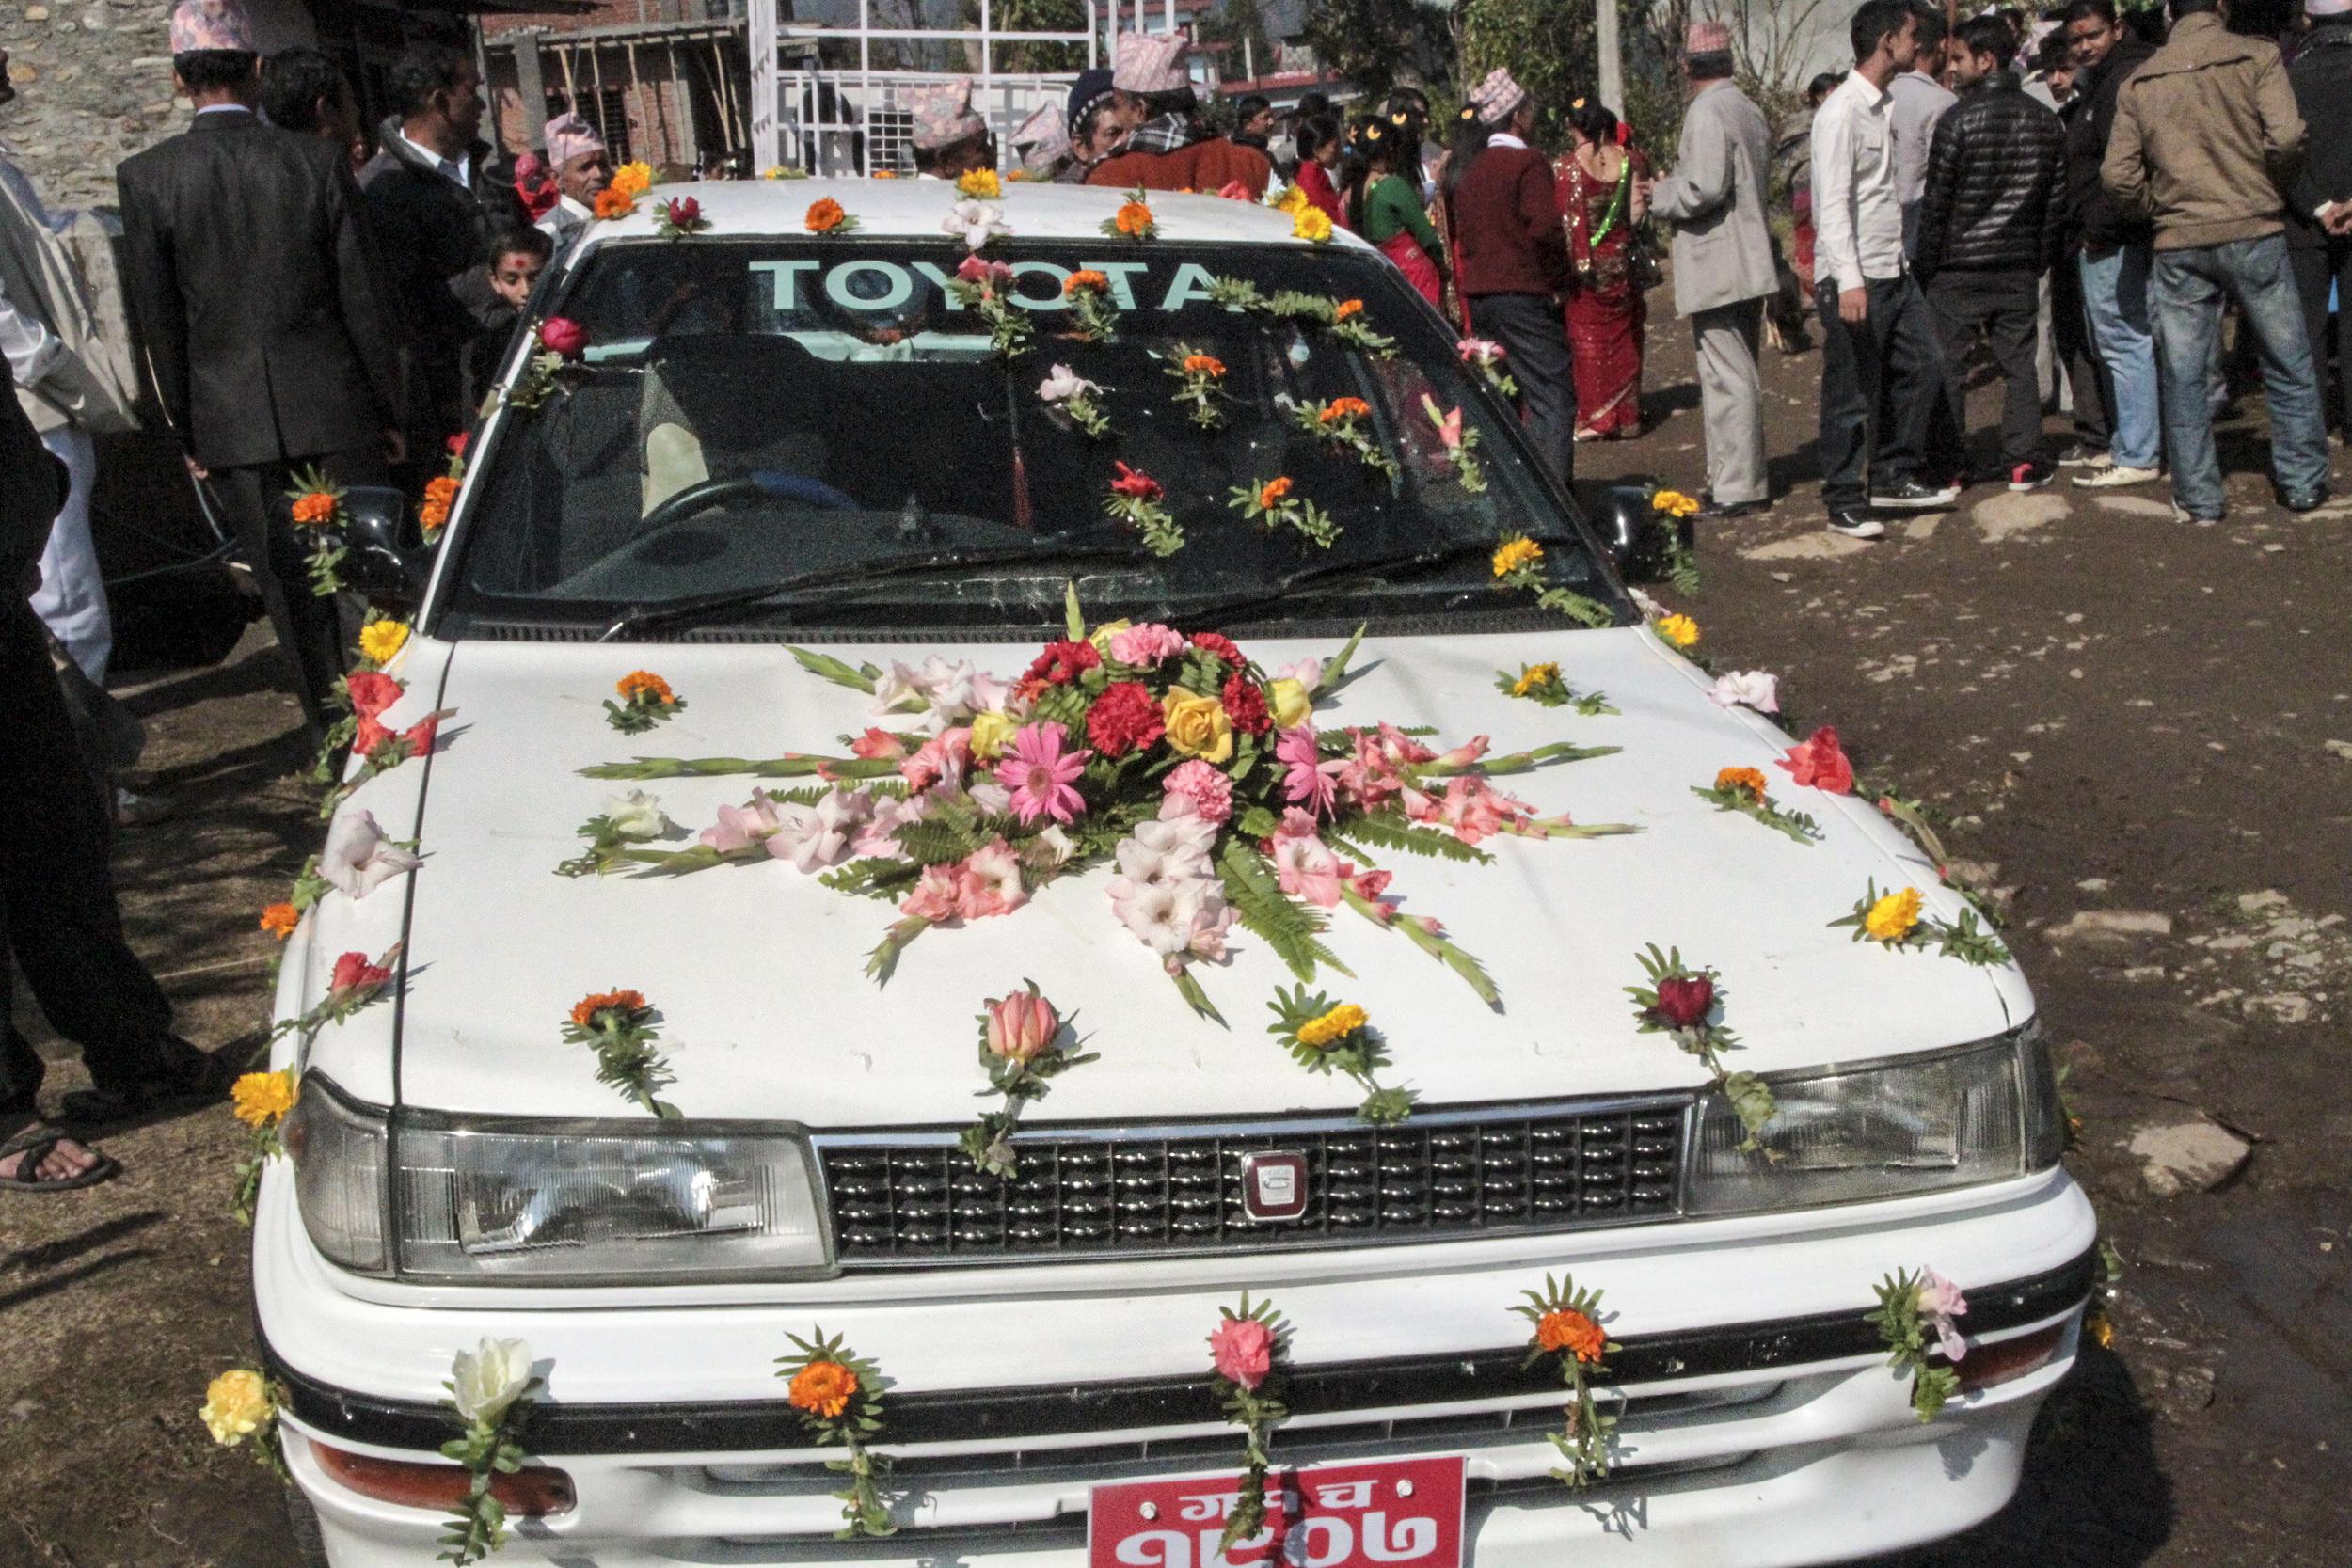 Wedding decorations. Pokara, Nepal